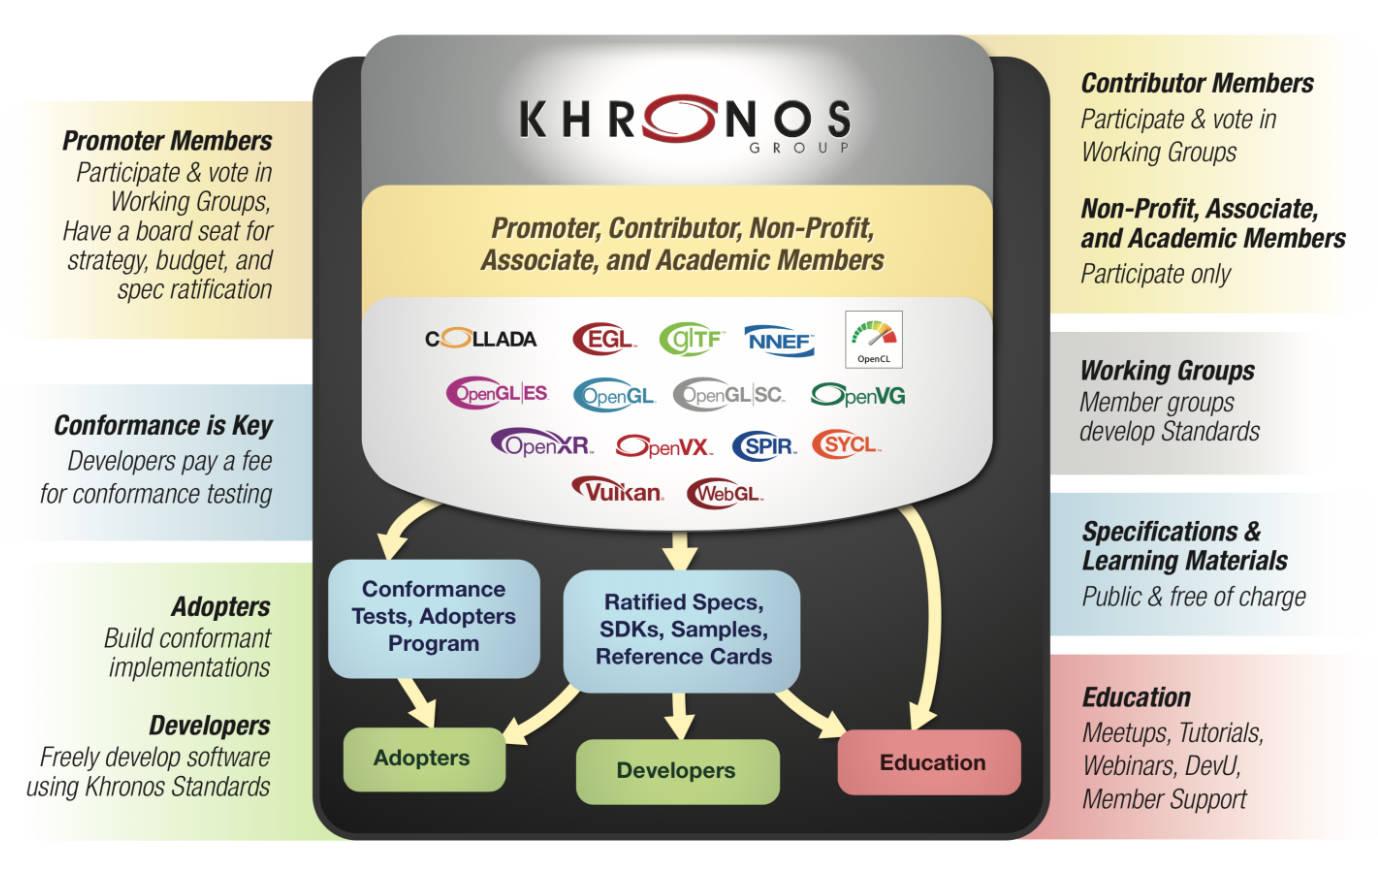 How the Khronos Group Works